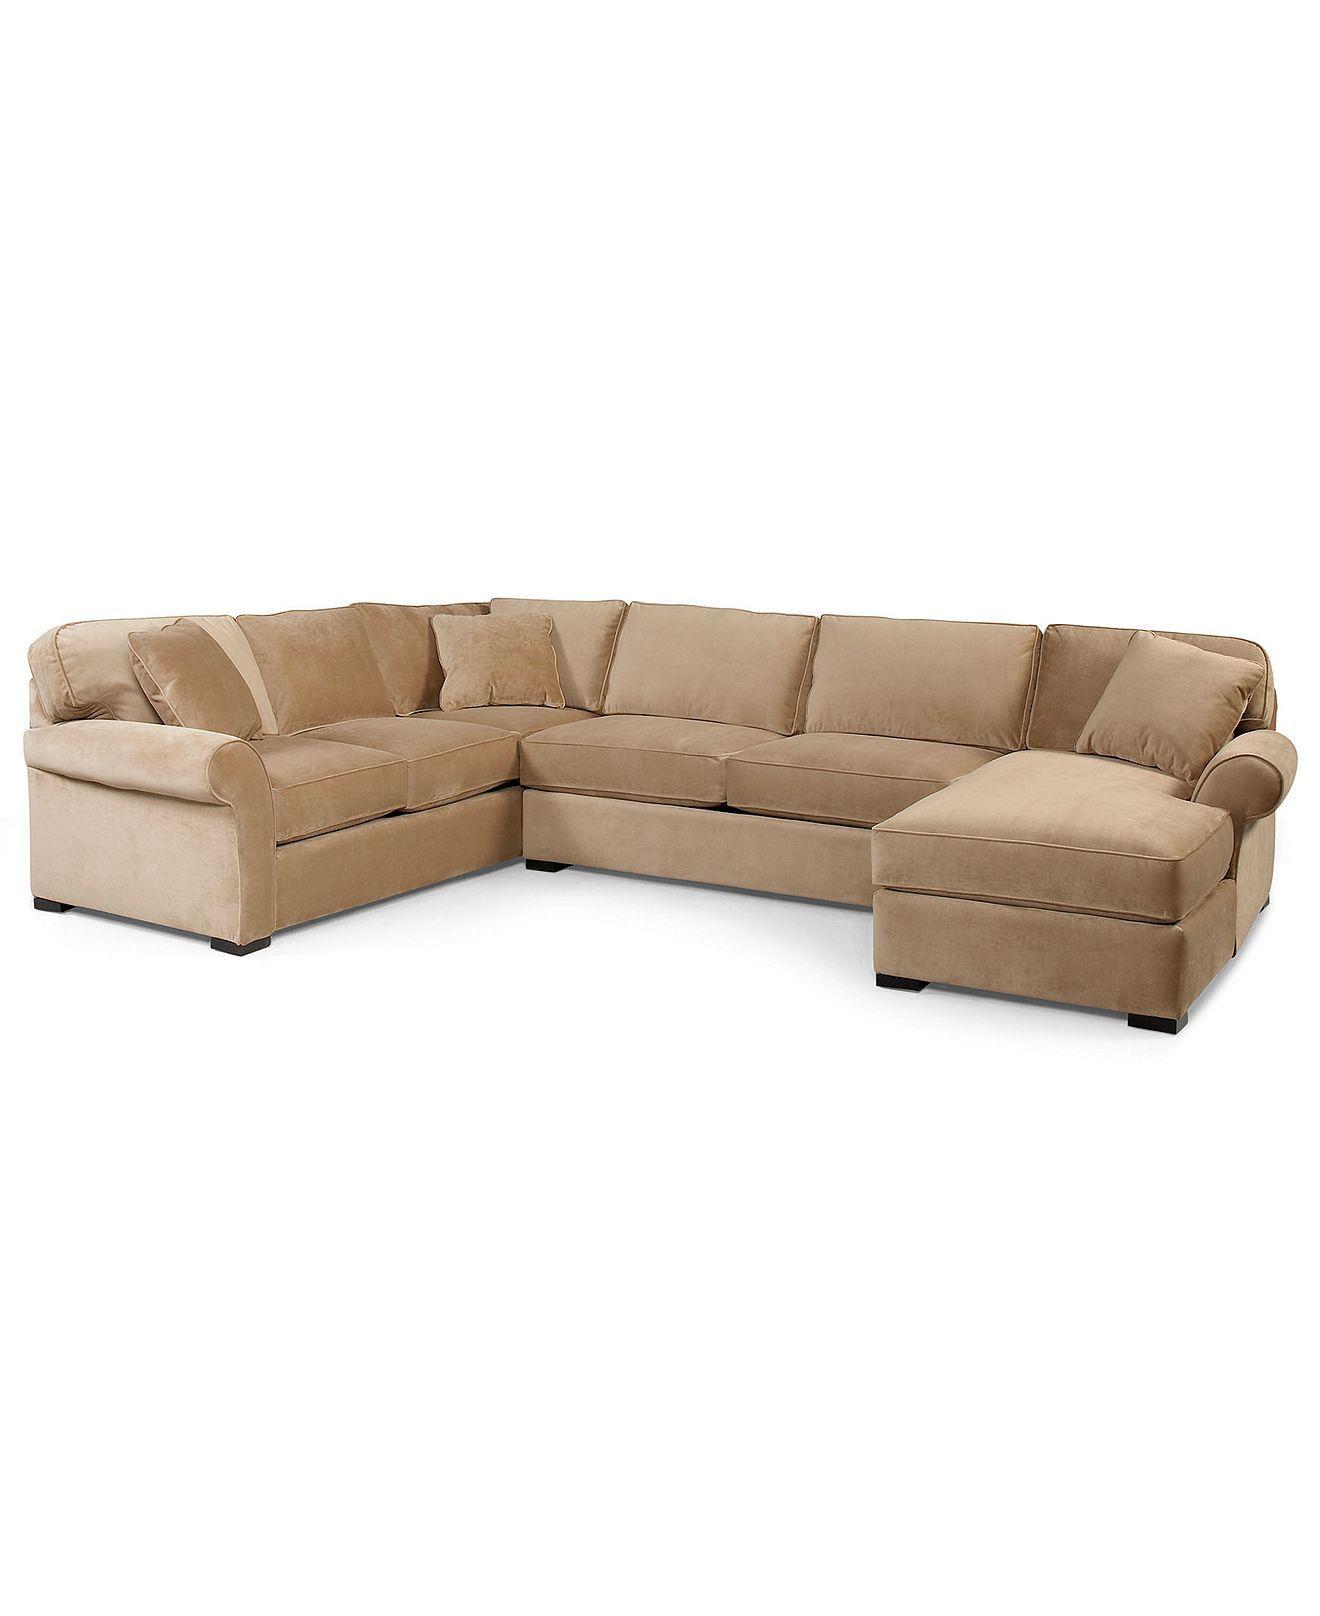 Joyce Fabric Sectional Sofa, 3 Piece (Apartment Sofa, Chaise & Sofa ...